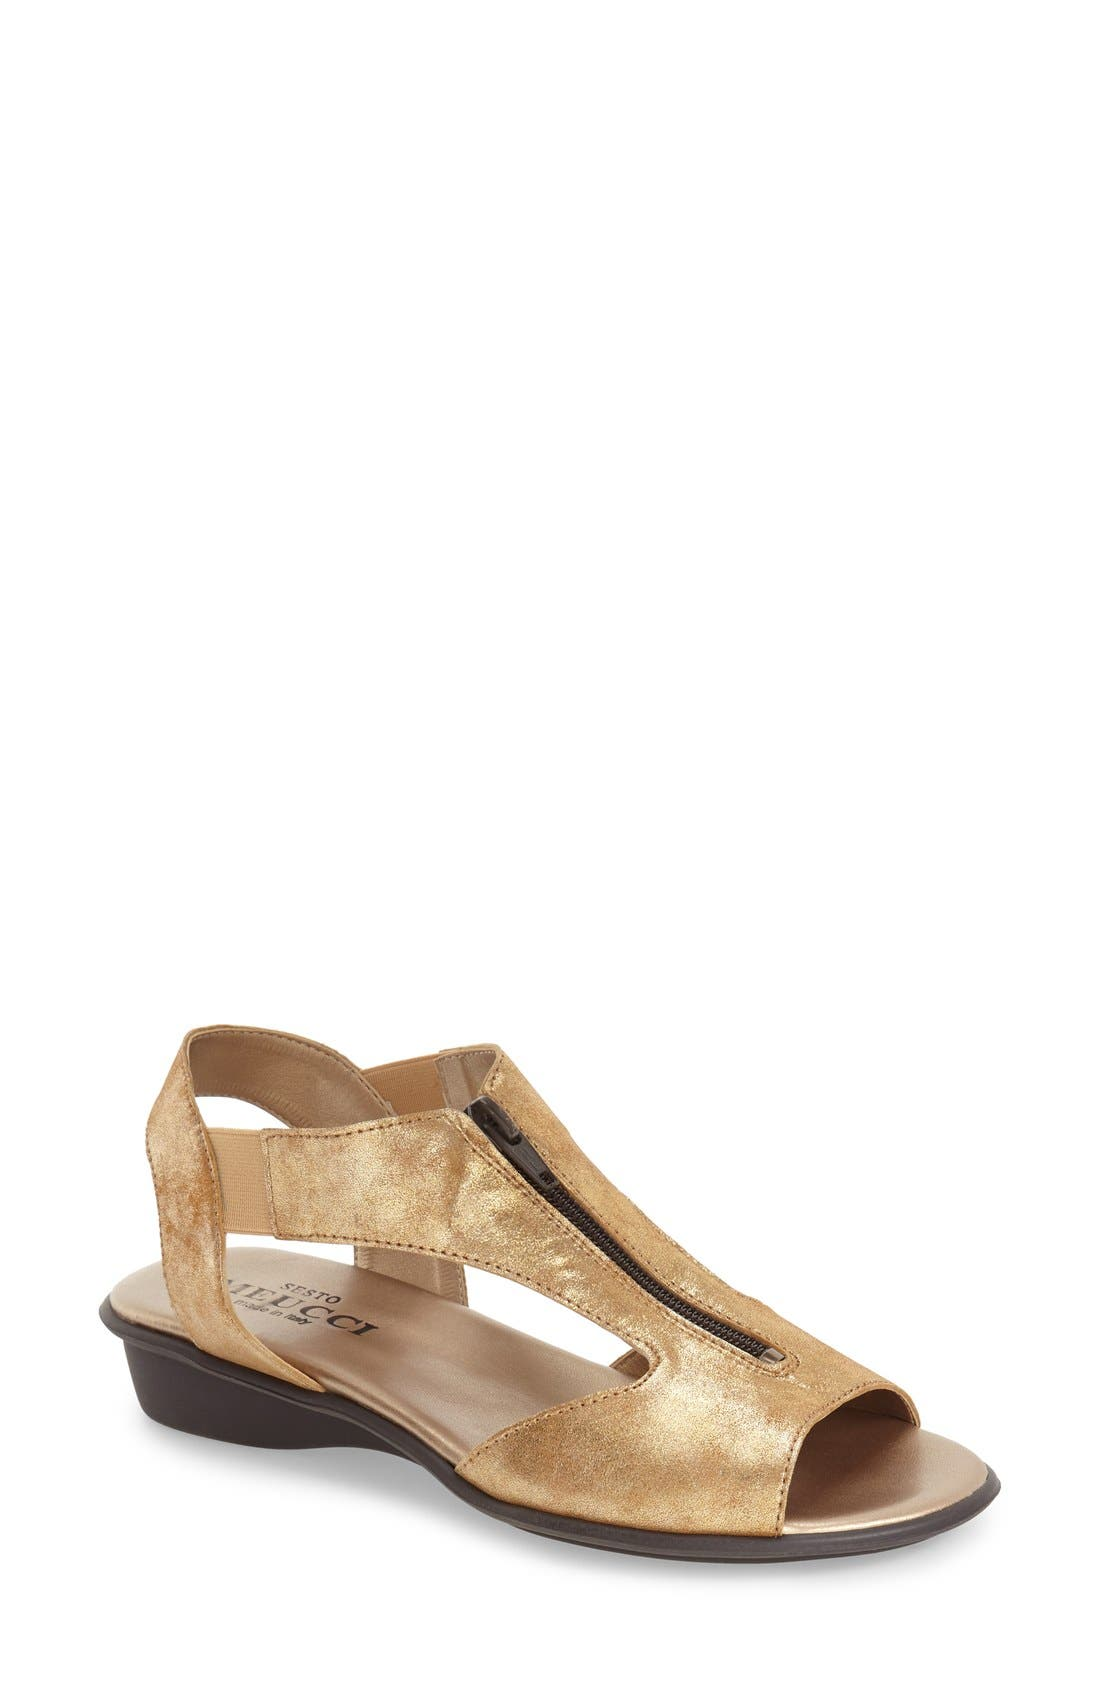 SESTO MEUCCI 'Euclid' Sandal in Brown Leather